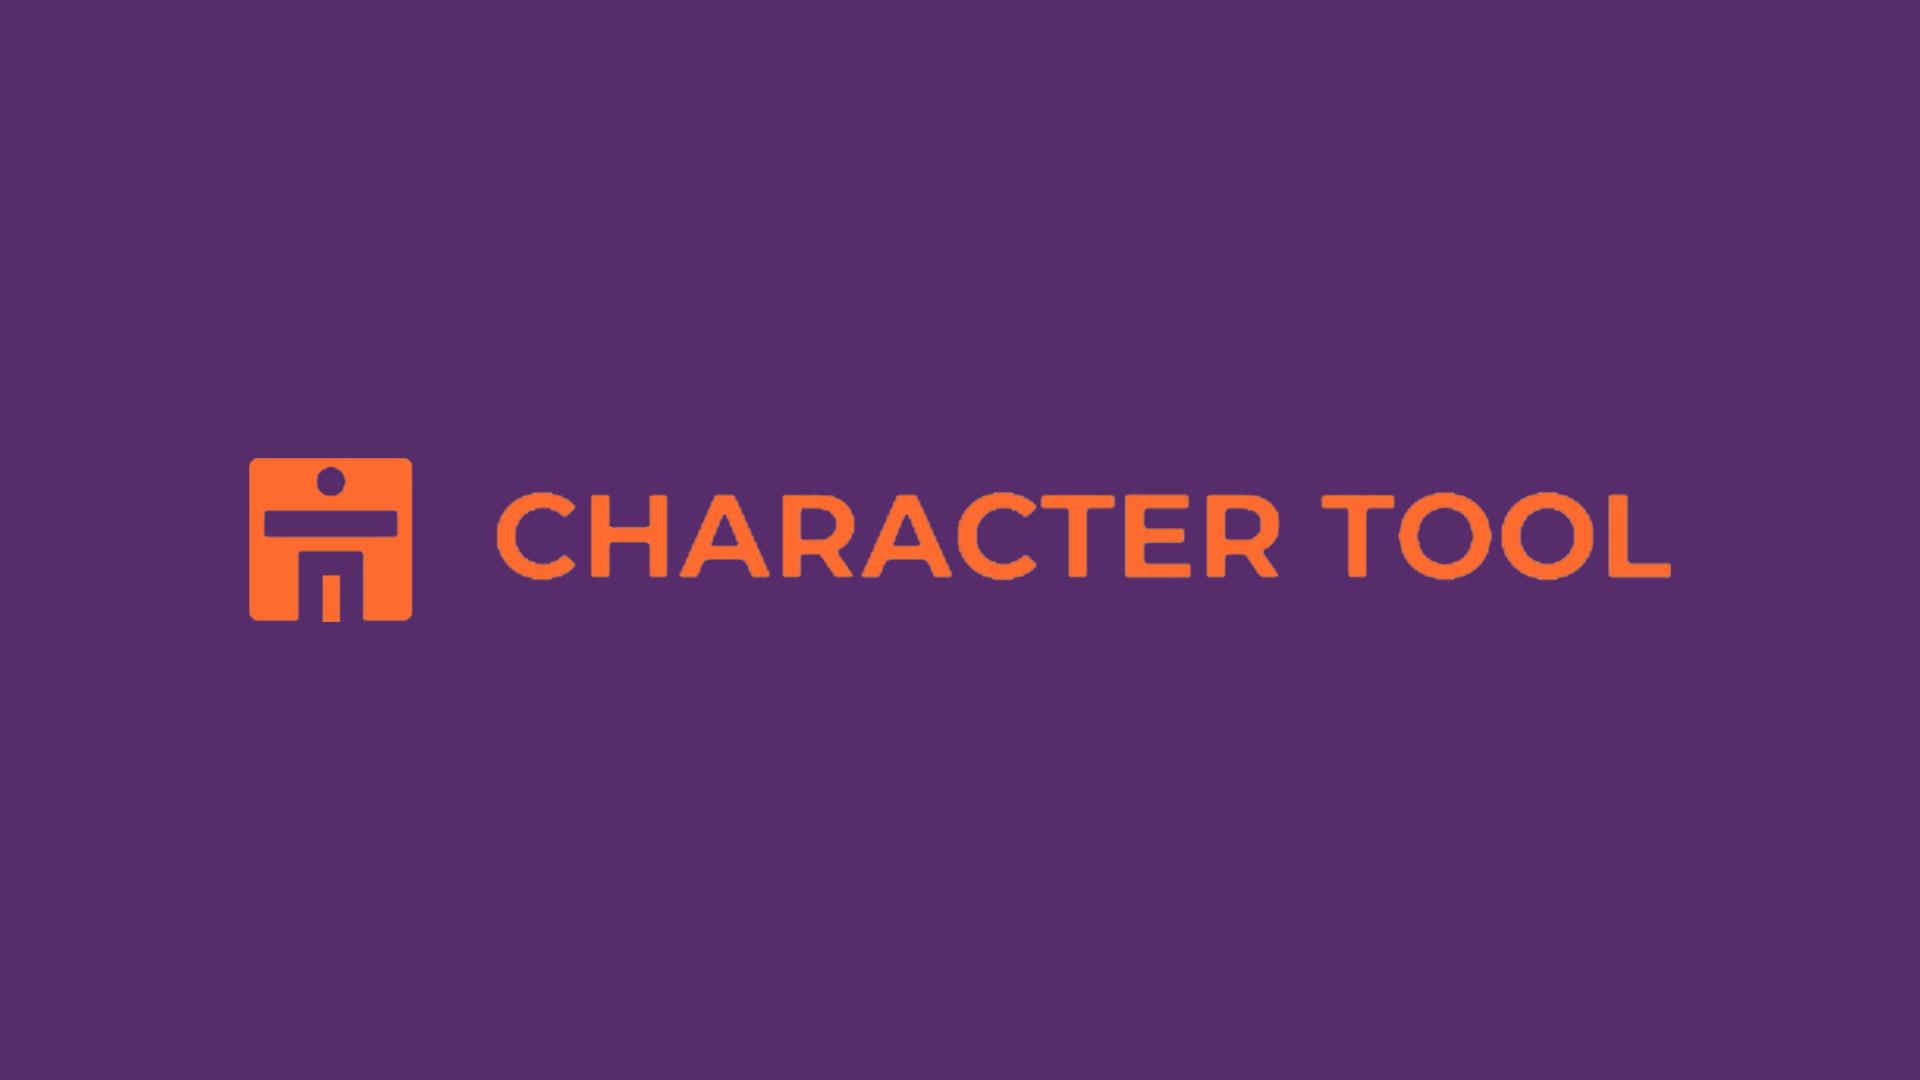 Character Tool